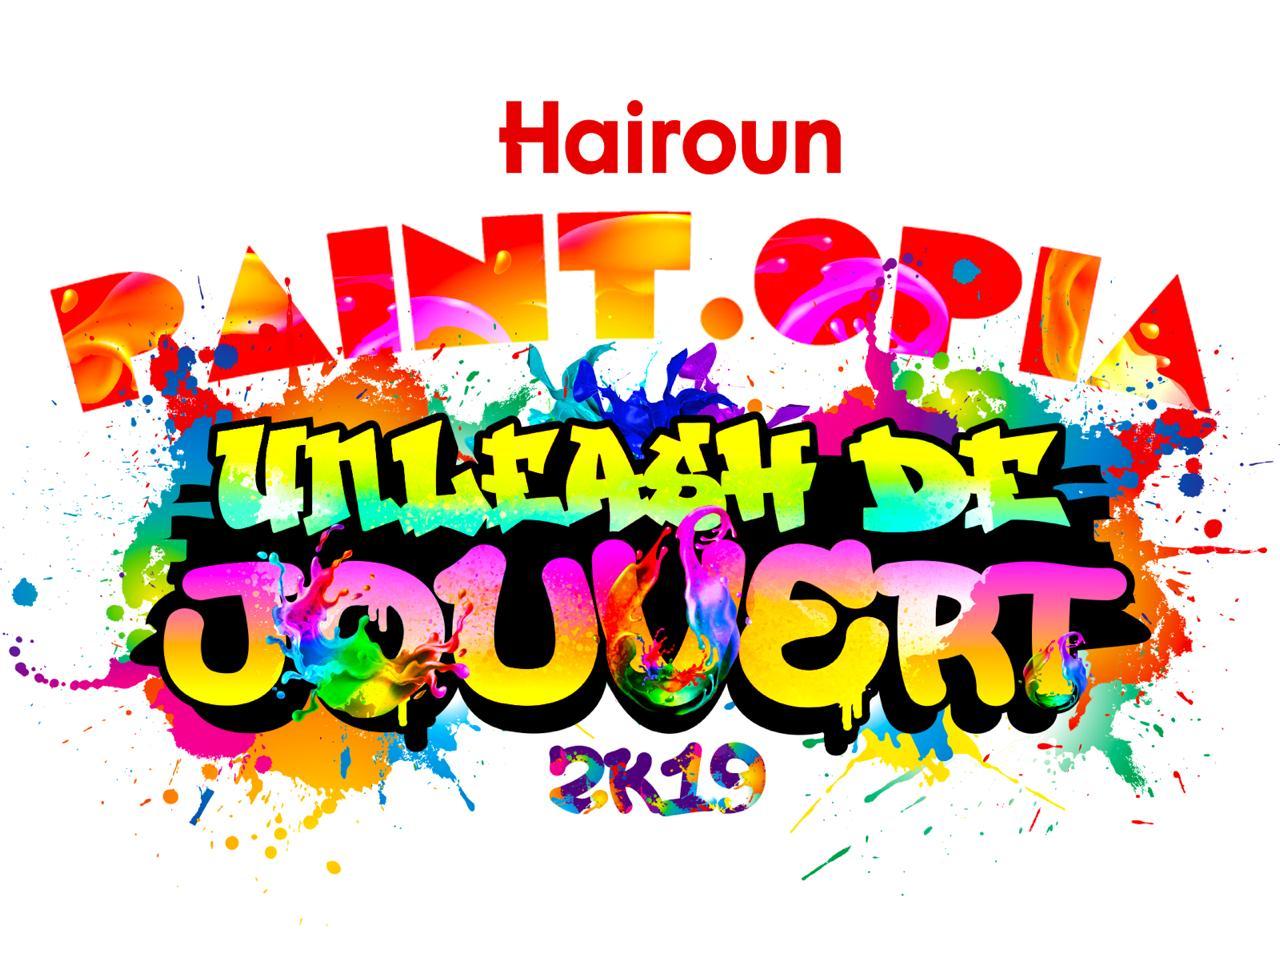 Hairoun Paintopia - Unleash De Jouvert 2k19